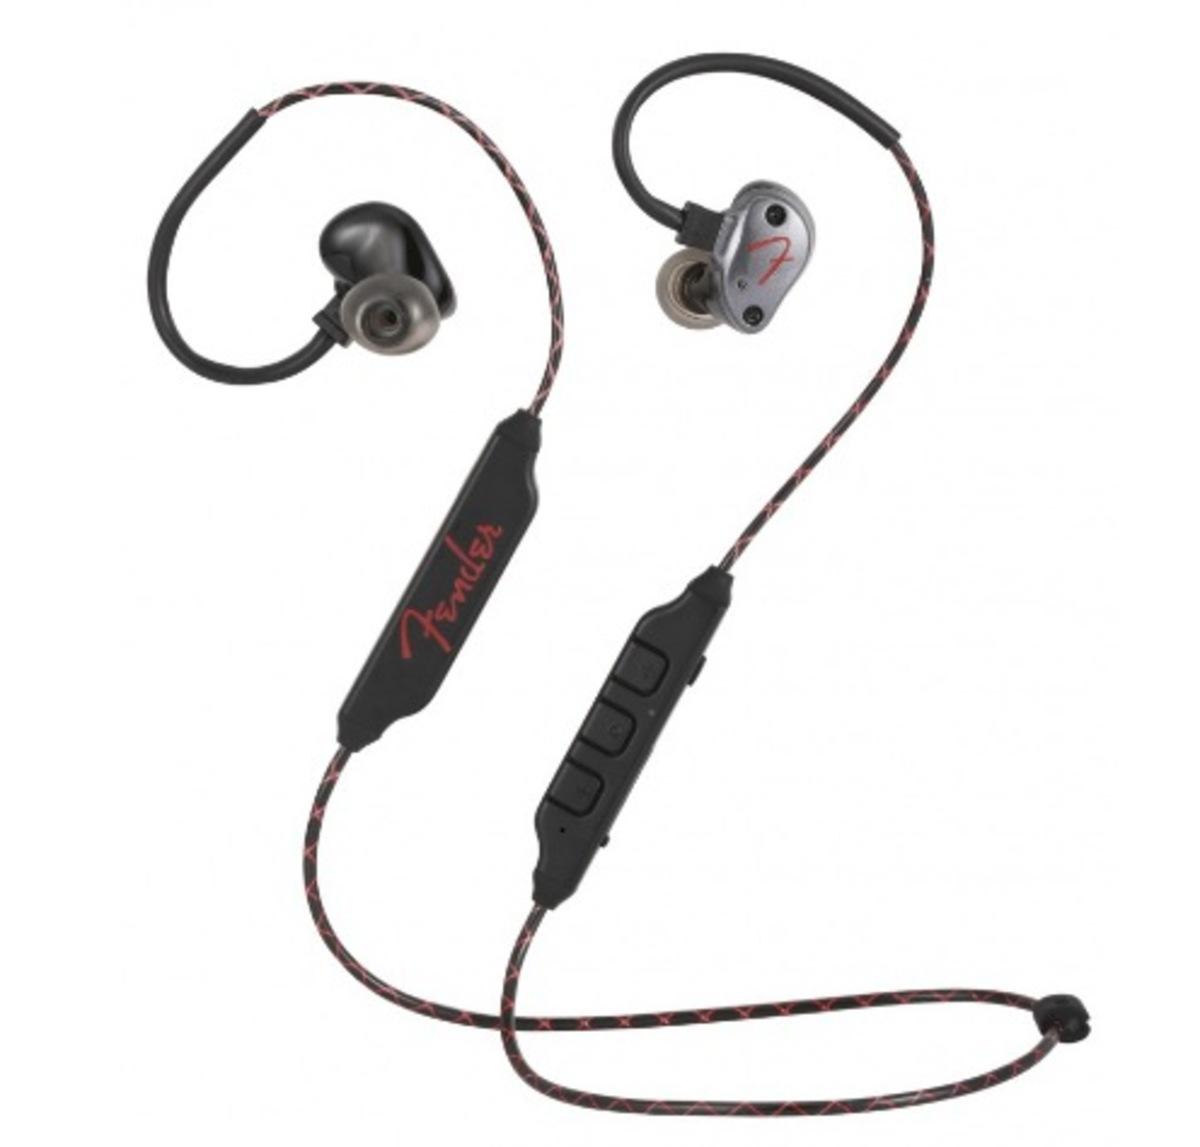 PureSonic Premium Wireless Earphones